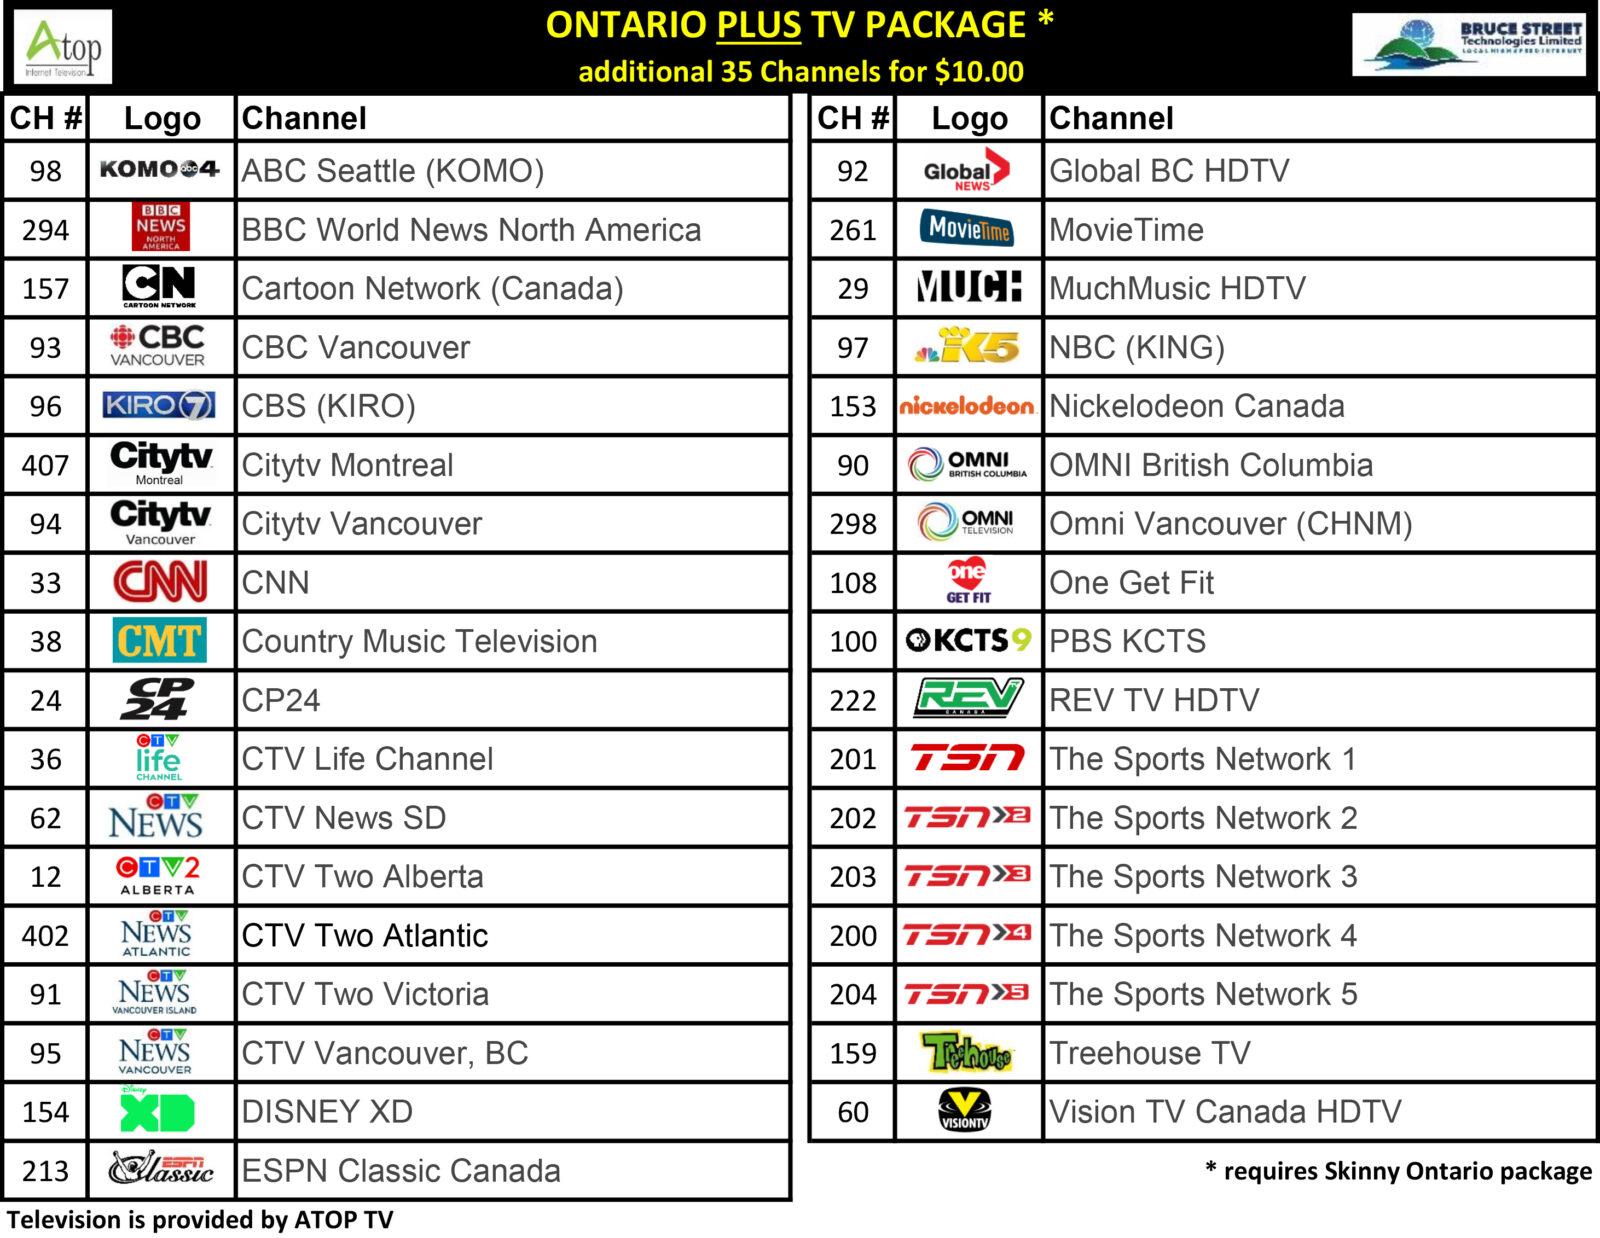 ATOP Ontario Plus TV Package